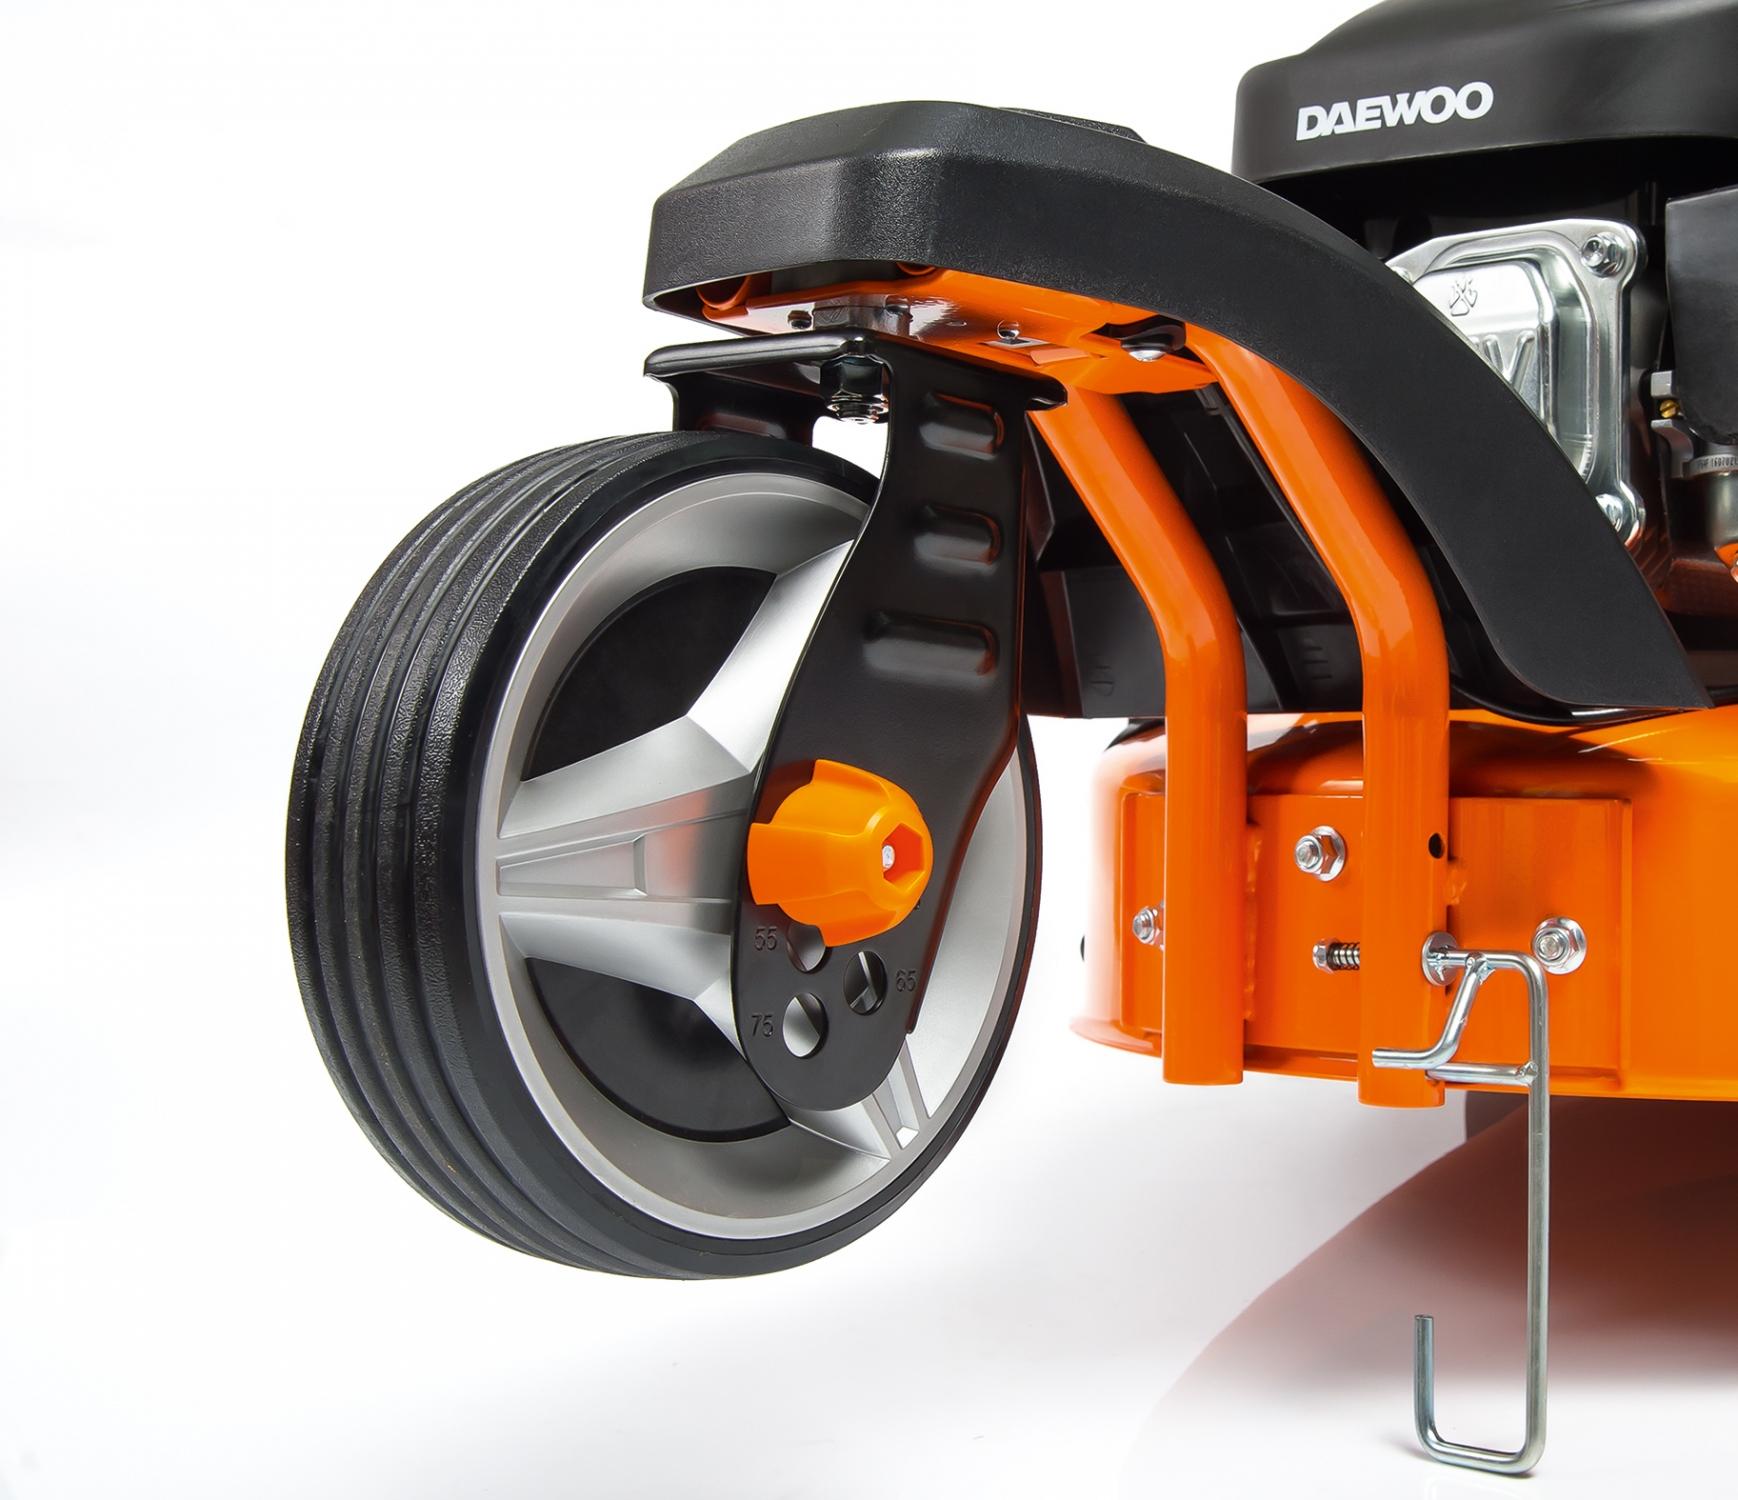 Бензинова газонокосарка Daewoo  DLM 5100SR